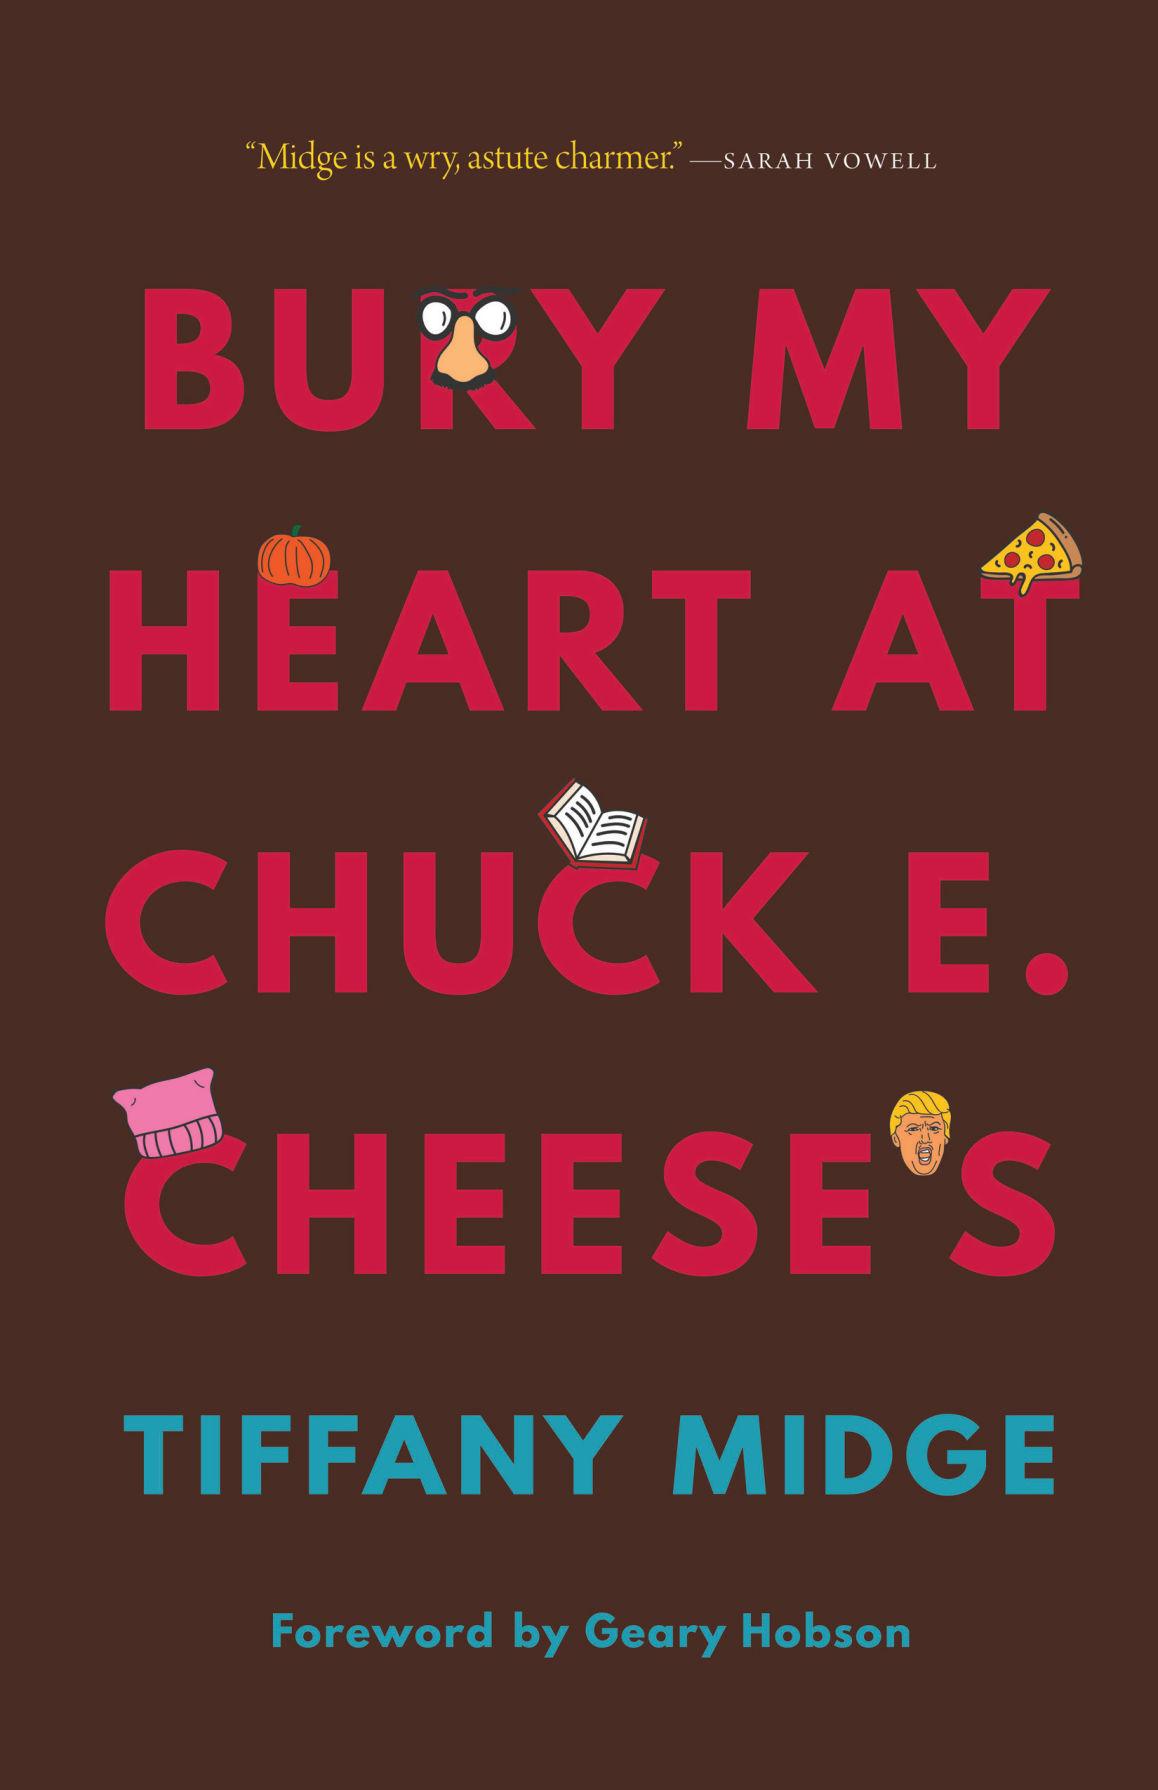 Tiffany Midge